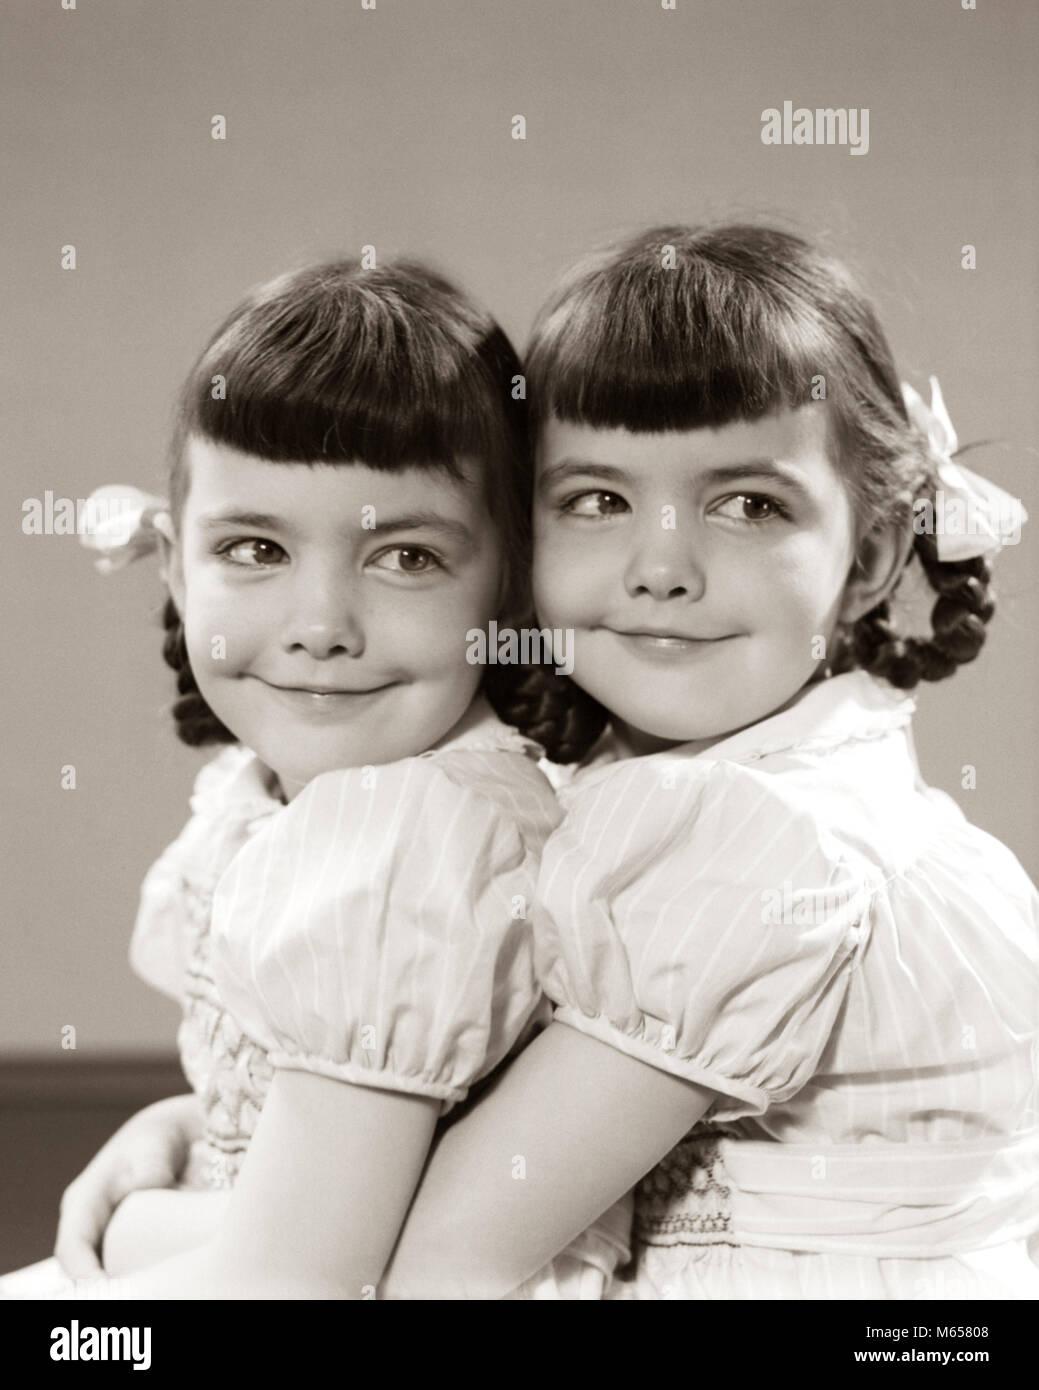 1940s 1950s TWIN GIRLS SMILING HUGGING - j1832 HAR001 HARS SIBLINGS SISTERS NOSTALGIA TOGETHERNESS 3-4 YEARS BRUNETTE - Stock Image